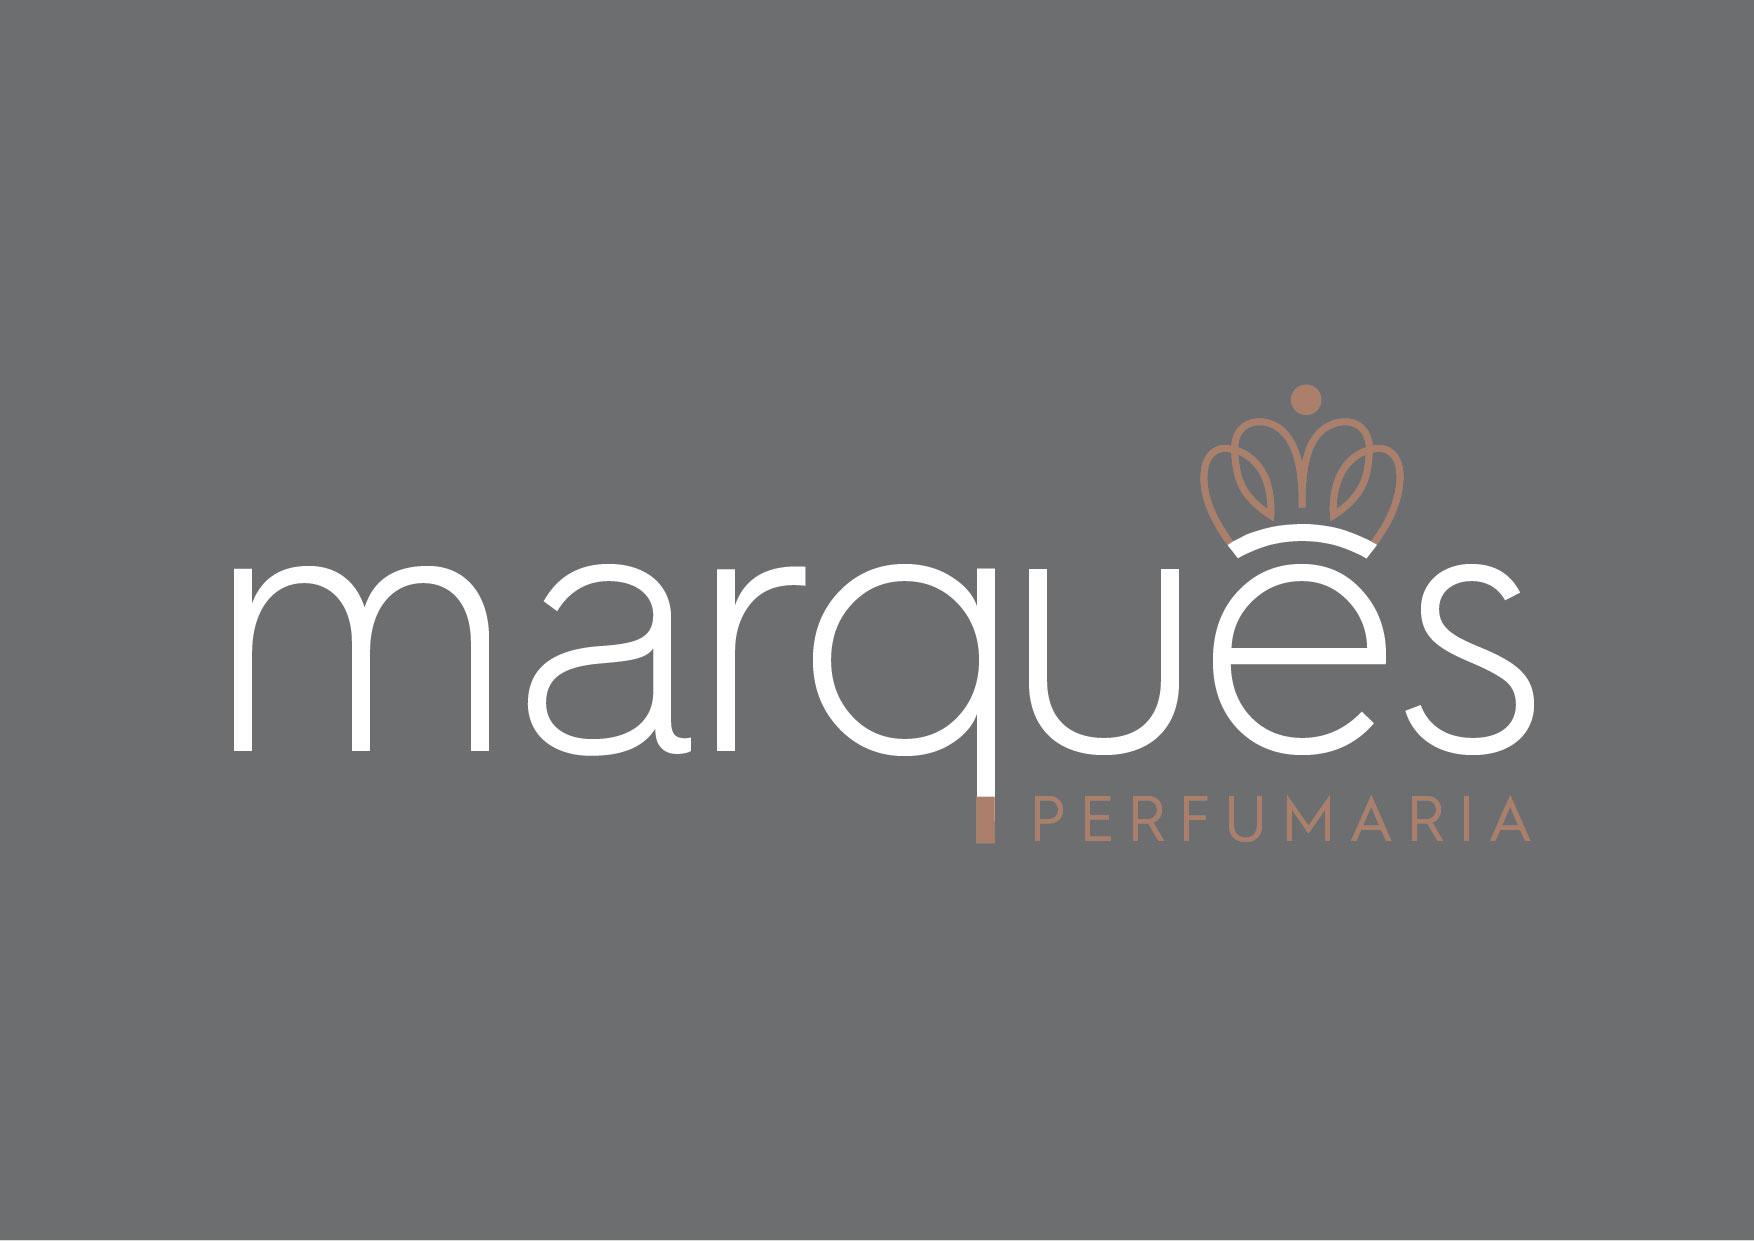 LOGO-MARQUÊS-PERFUMARIA-02